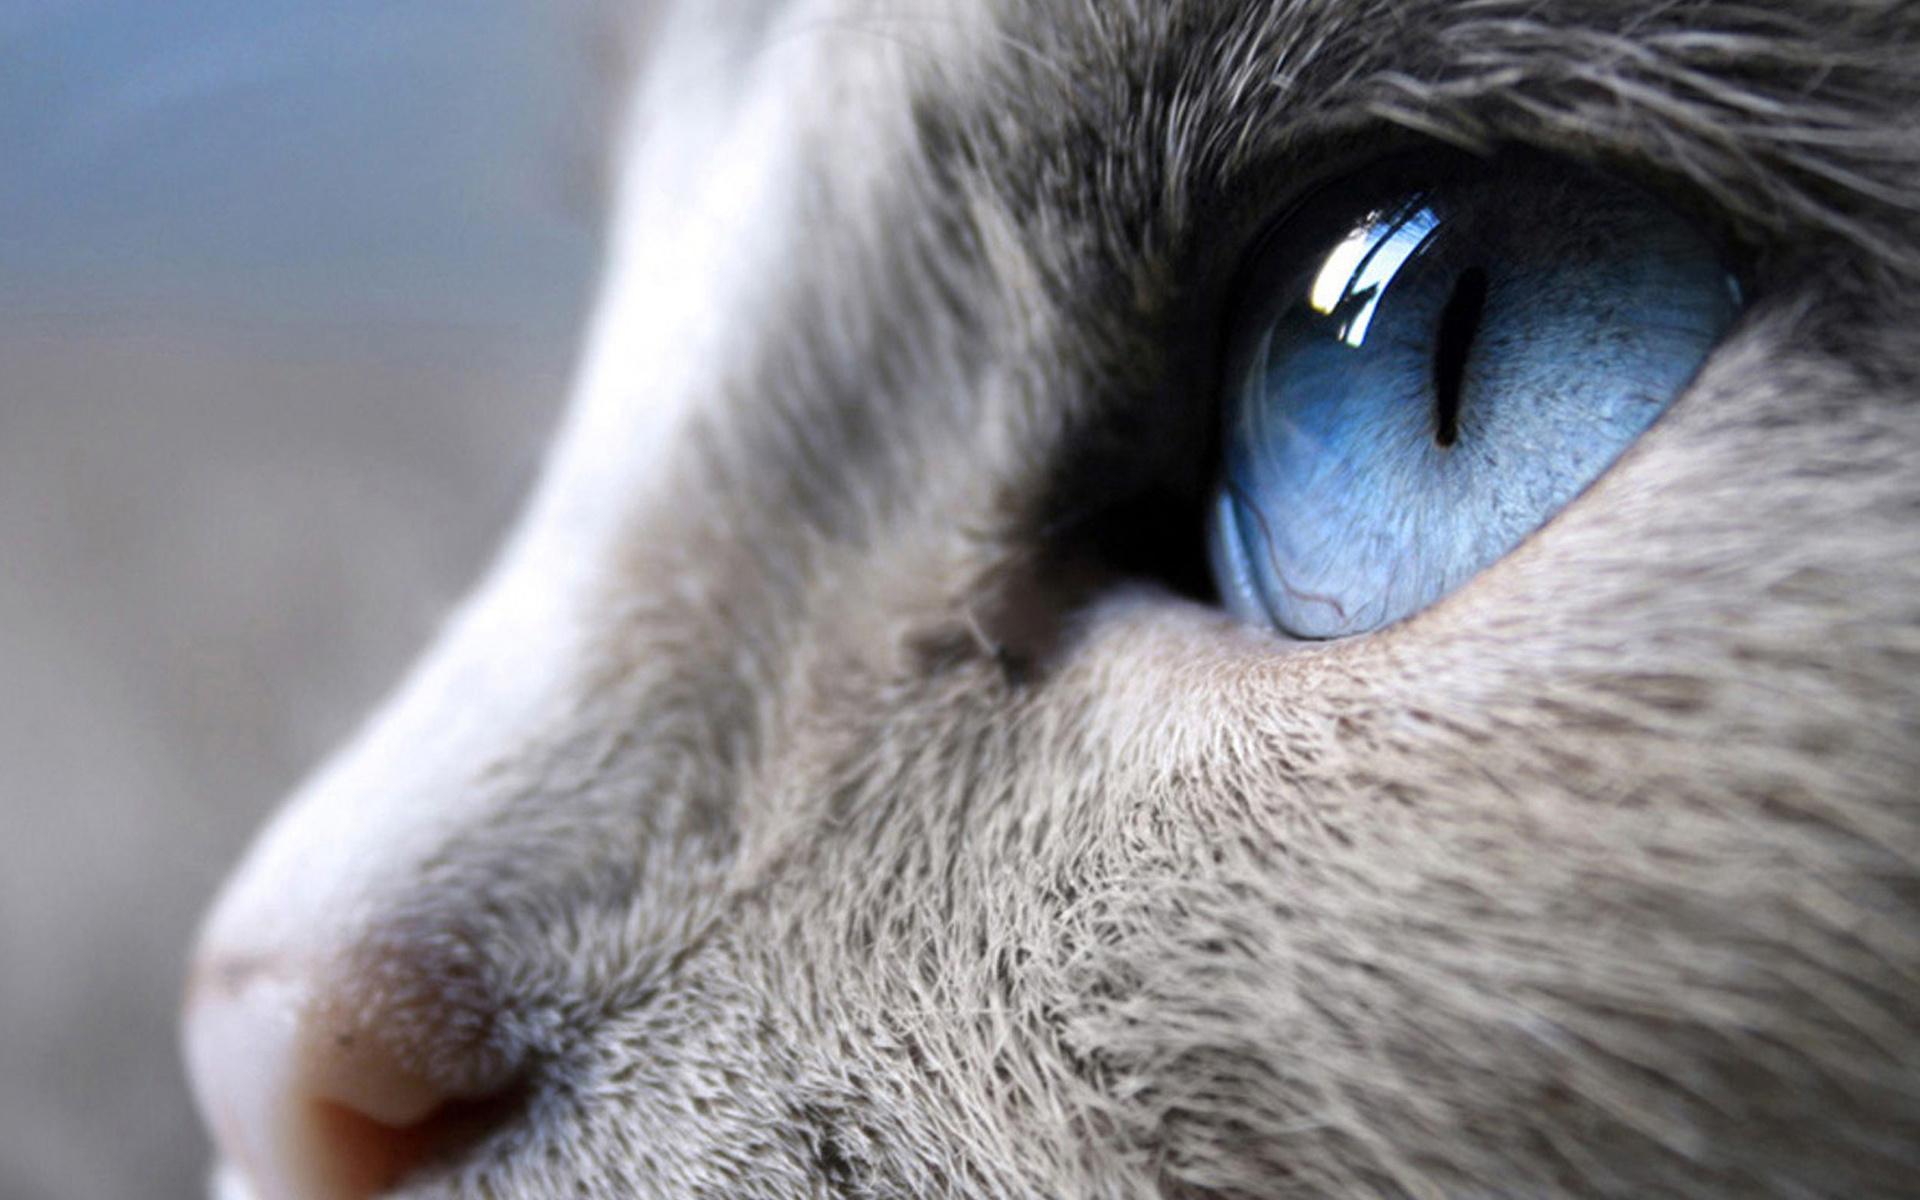 картинки на компьютер с животными: